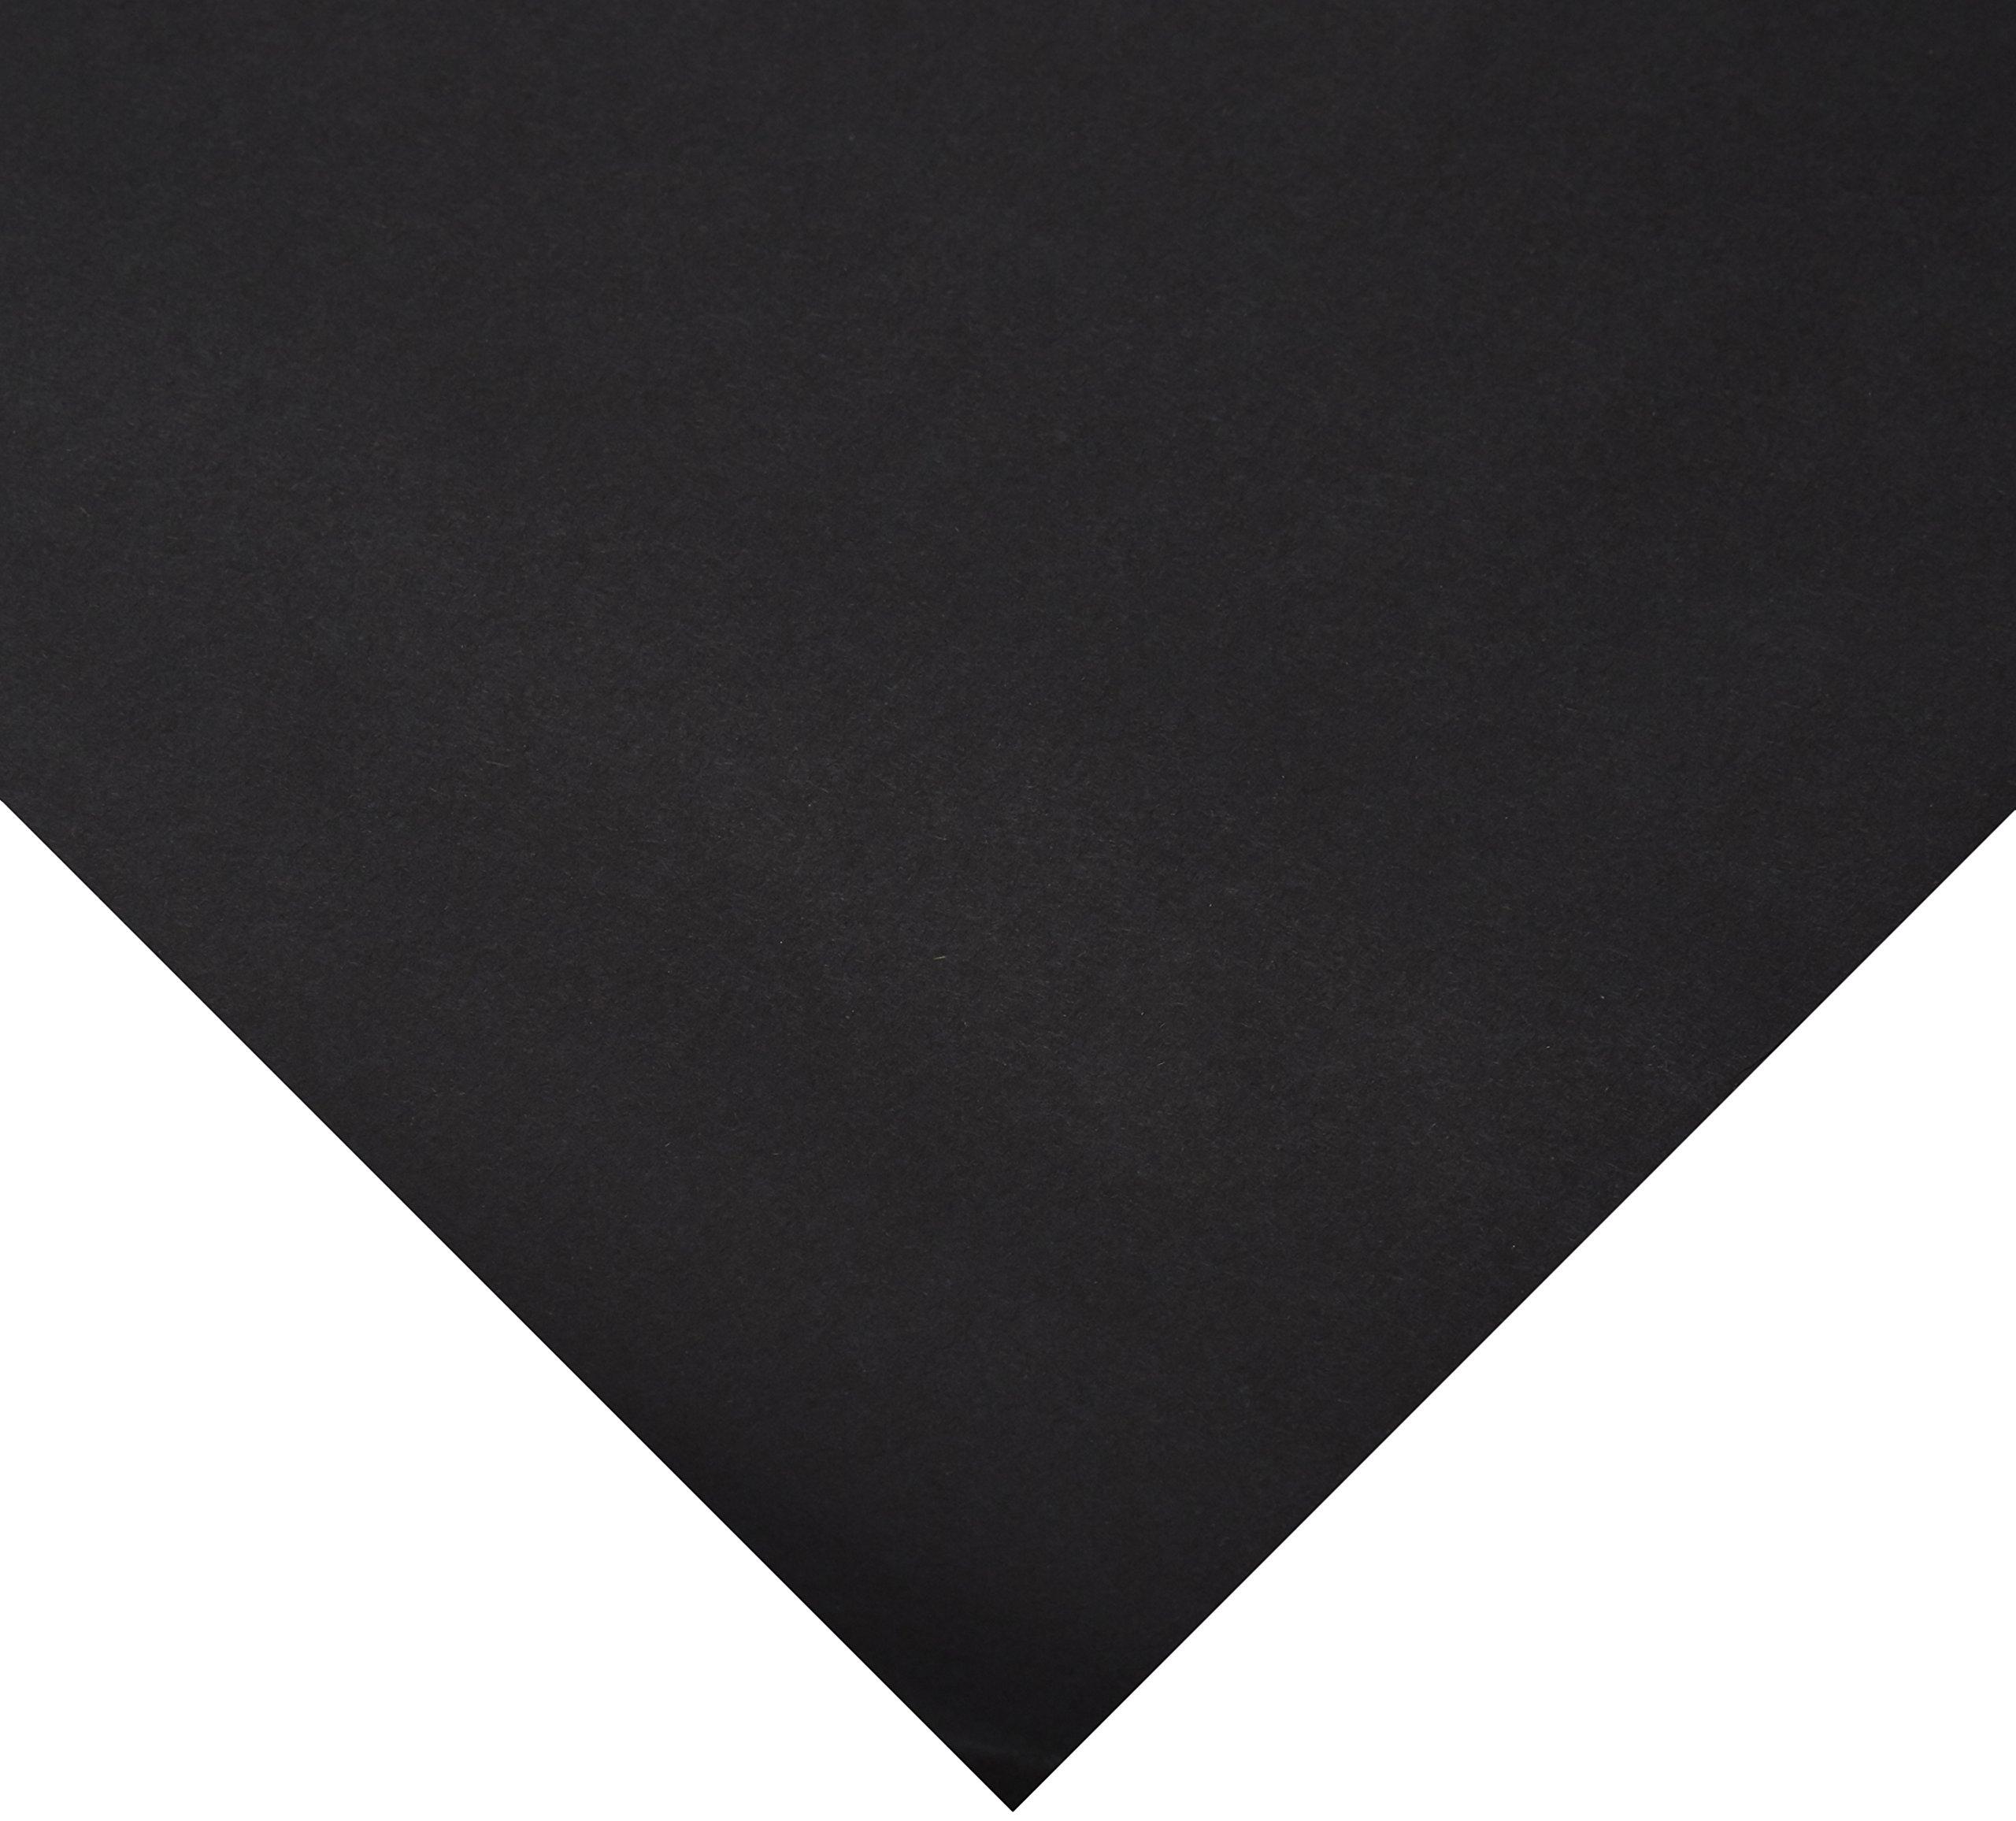 Rainbow. Kraft 1369530 0063304 Colored Paper Rolls, 48'' x 200' Size, Black